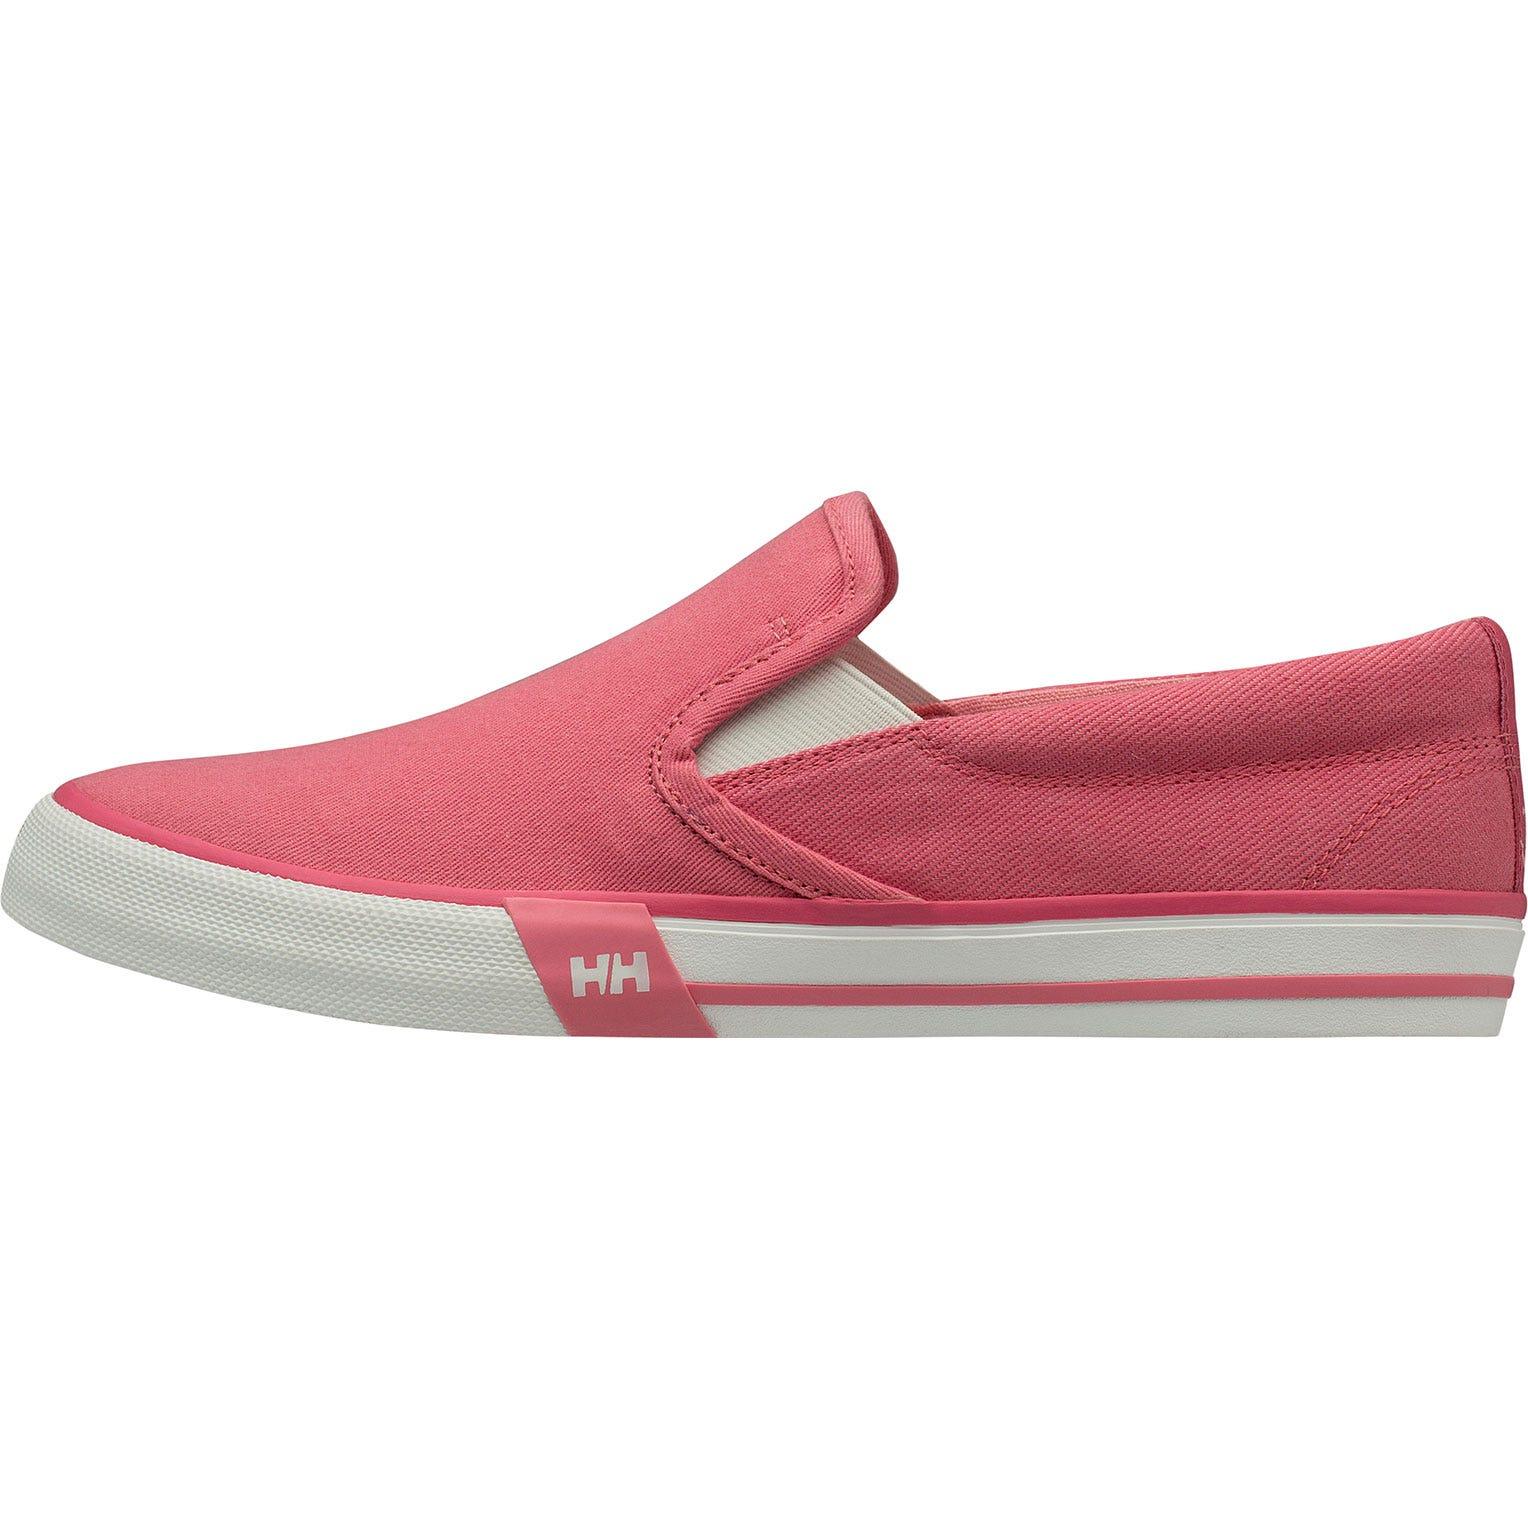 Helly Hansen W Copenhagen Slipon Shoe Womens Casual Pink 39.3/8